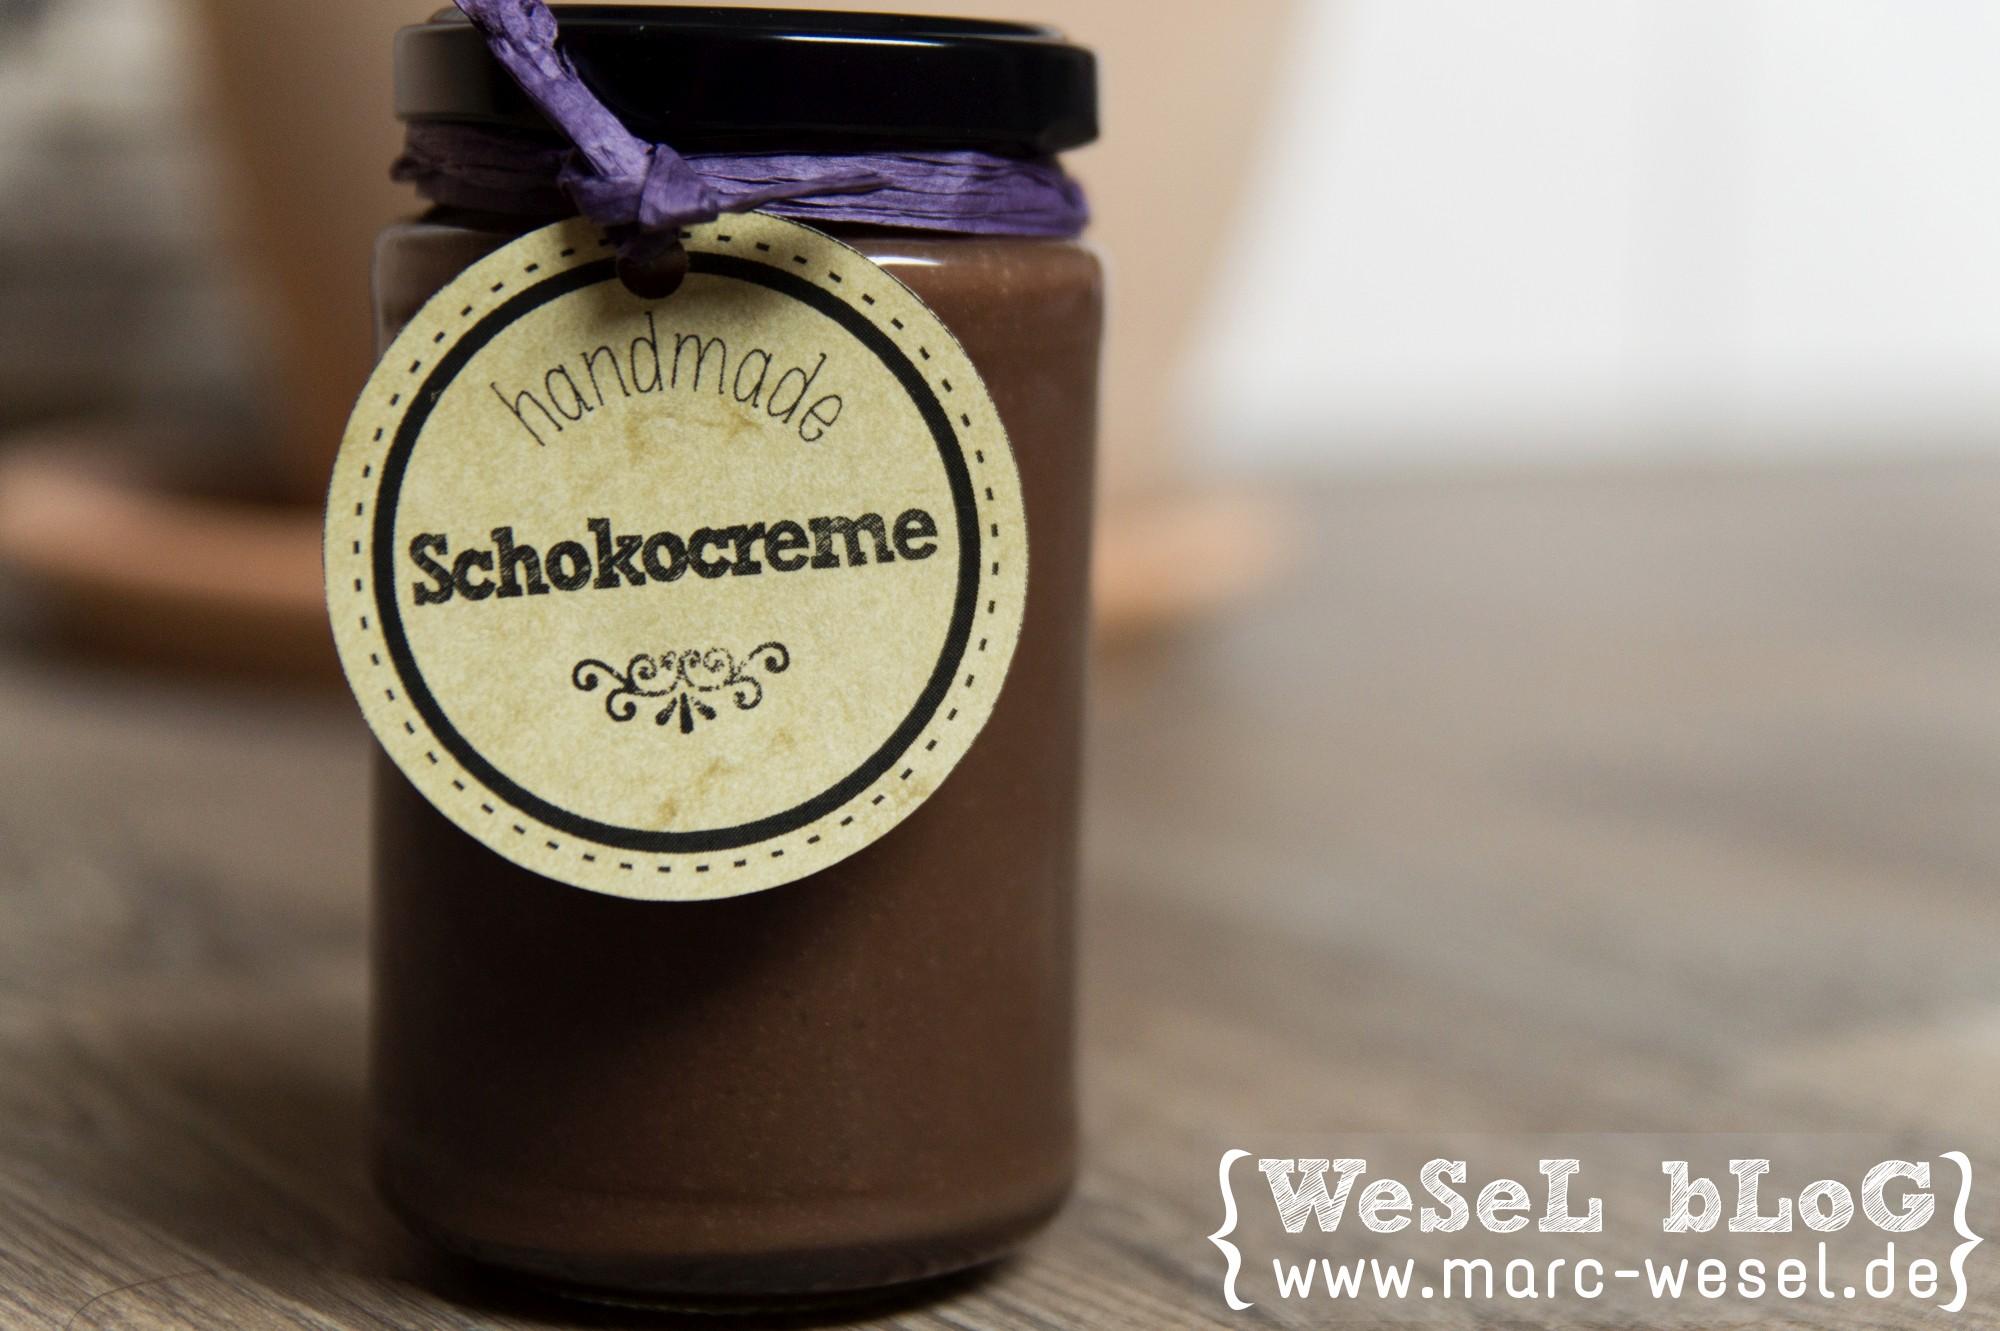 Schokocreme – handmade